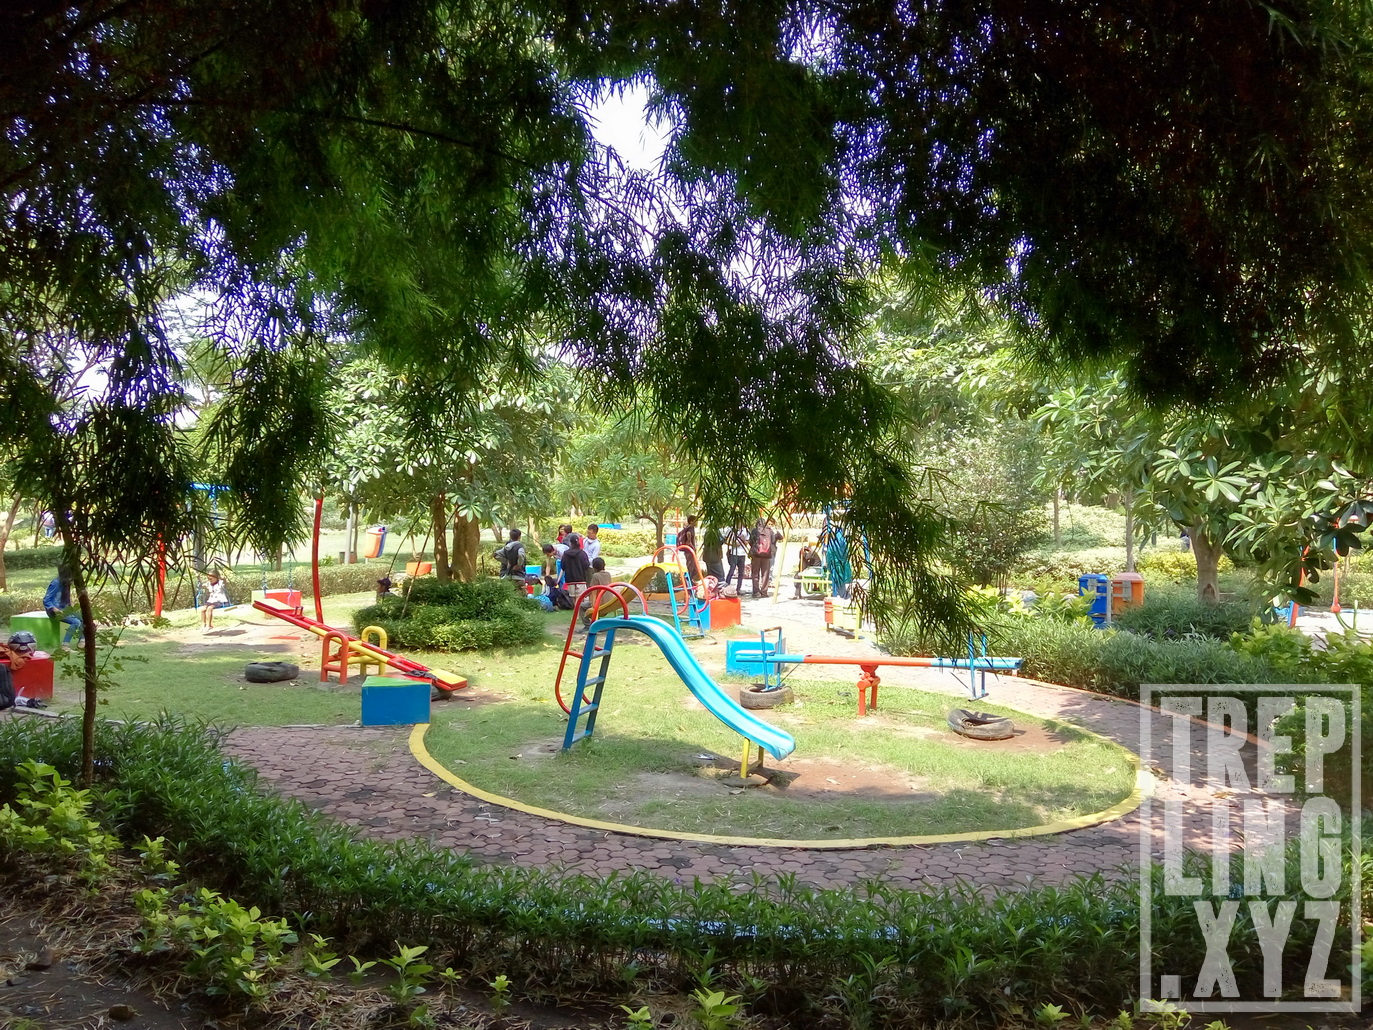 Rekreasi Bernuansa Asri Di Hutan Bambu Dan Taman Sakura Surabaya